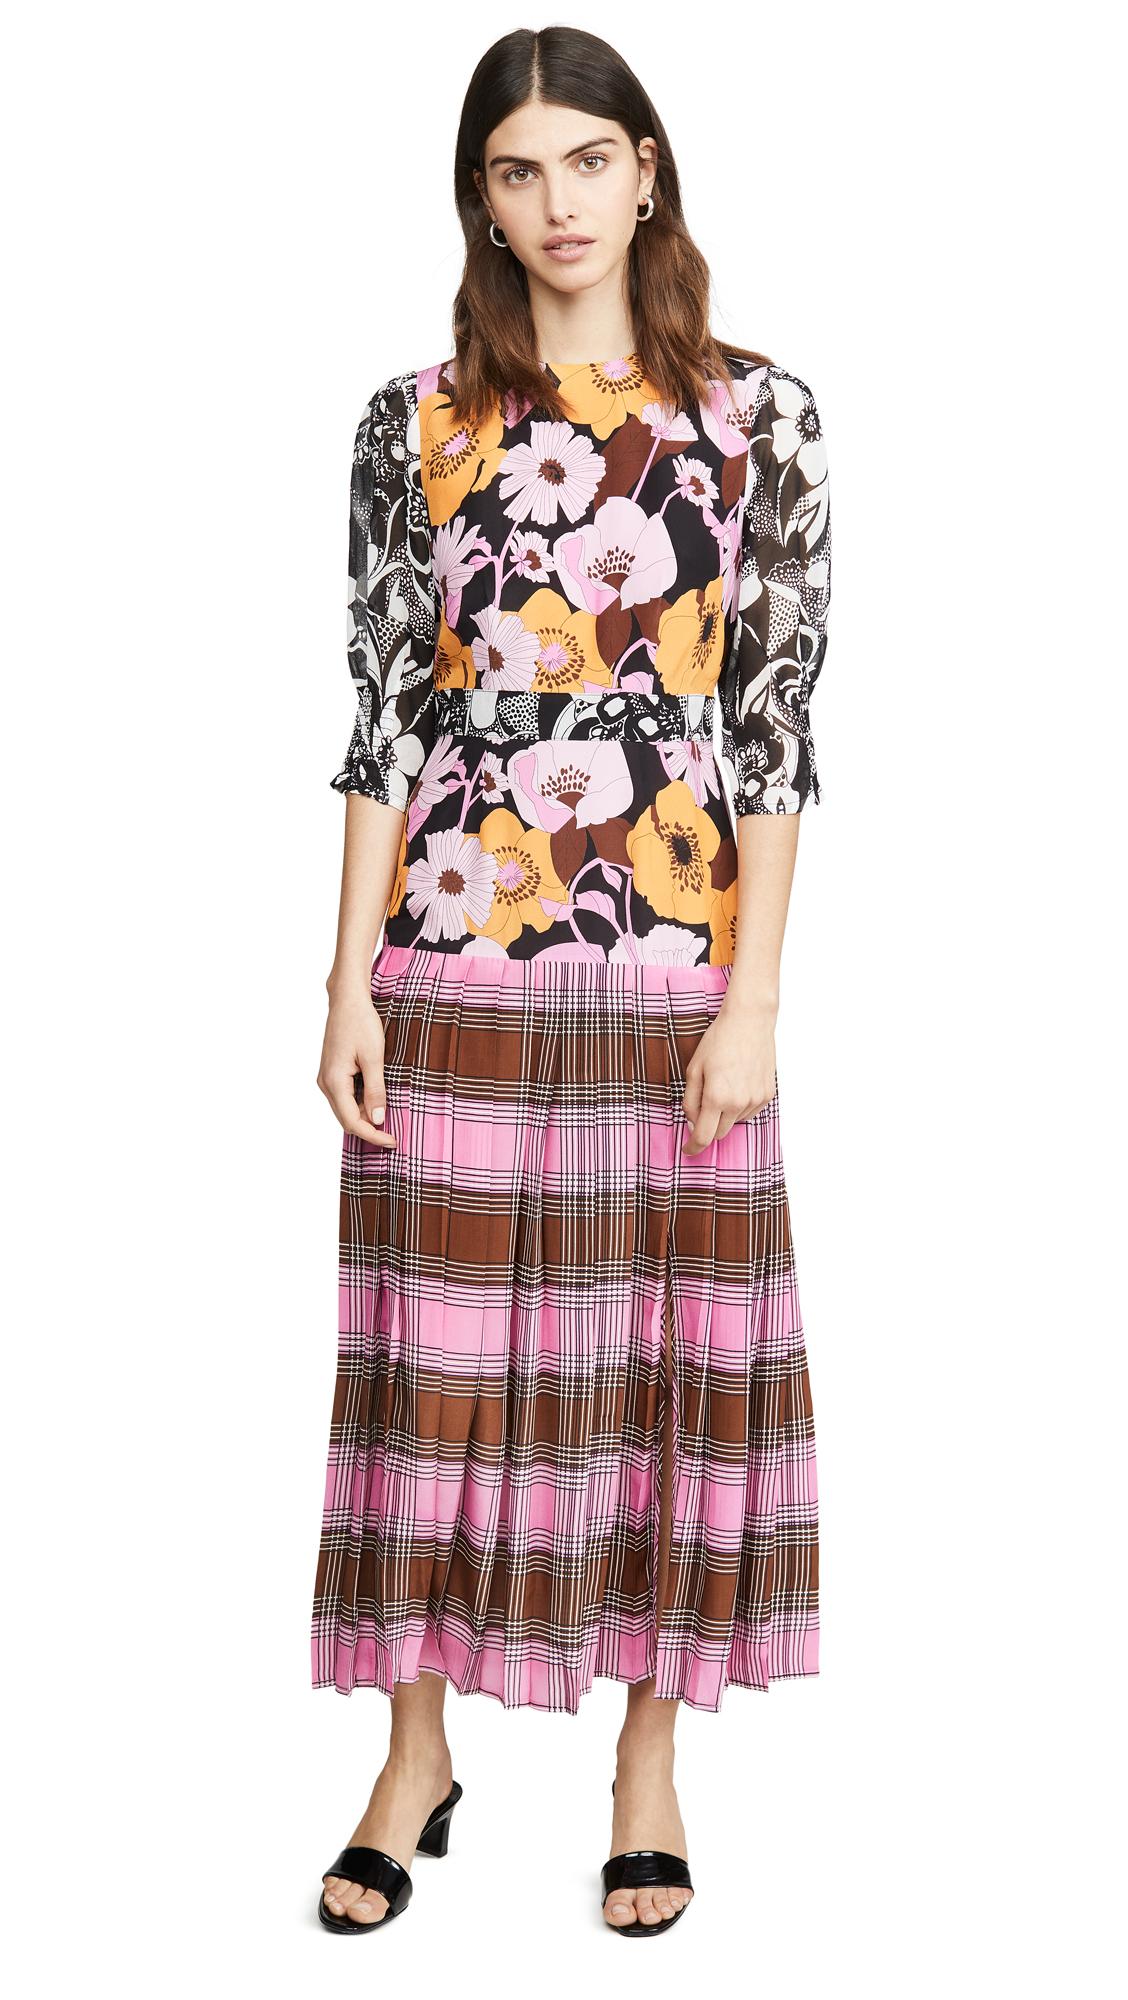 RIXO Cozi Dress - 50% Off Sale